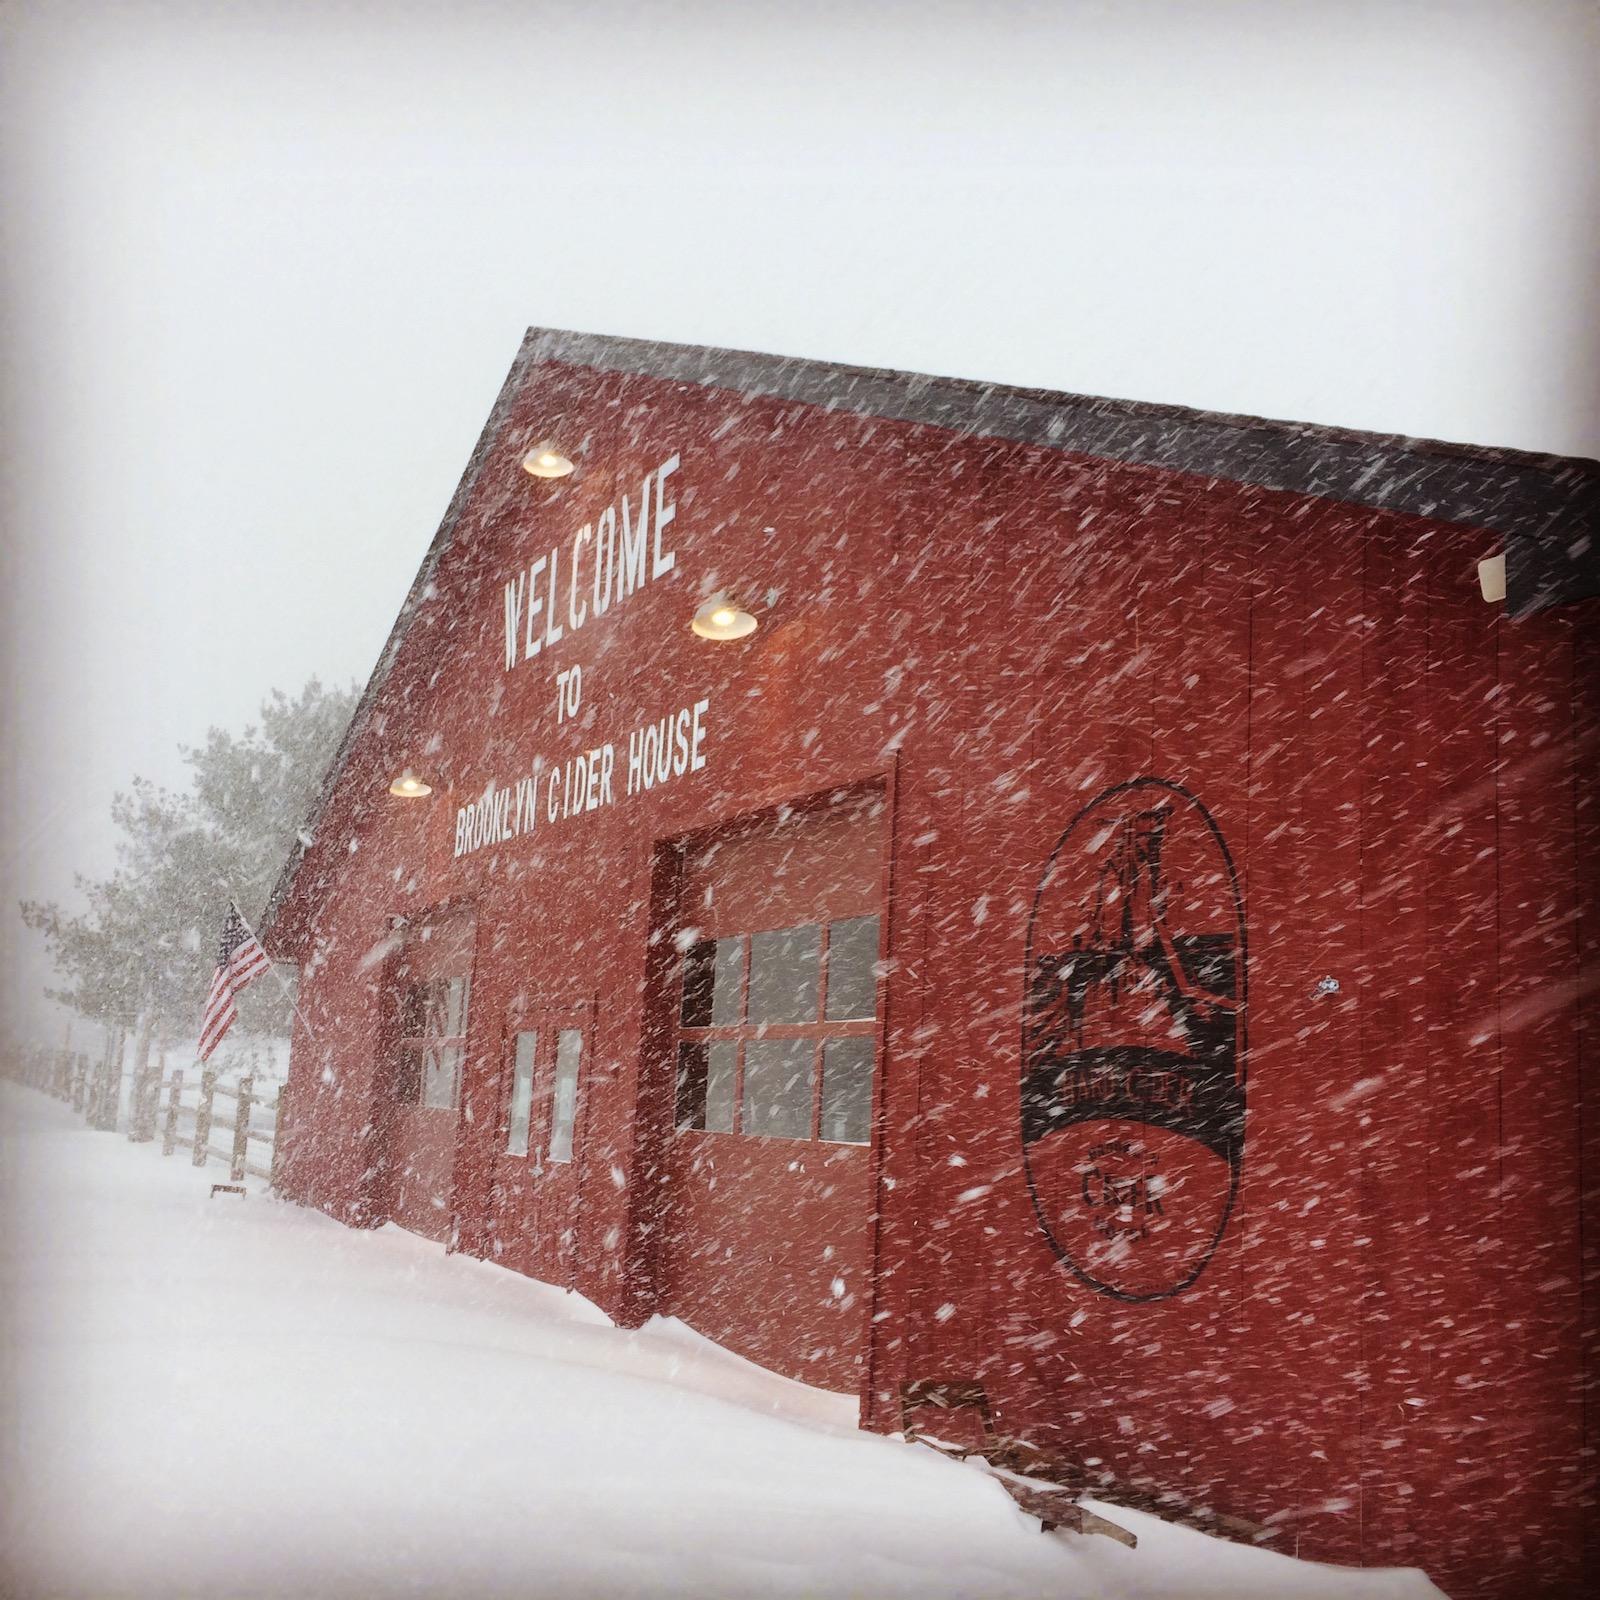 farm stand in blizzard.jpg